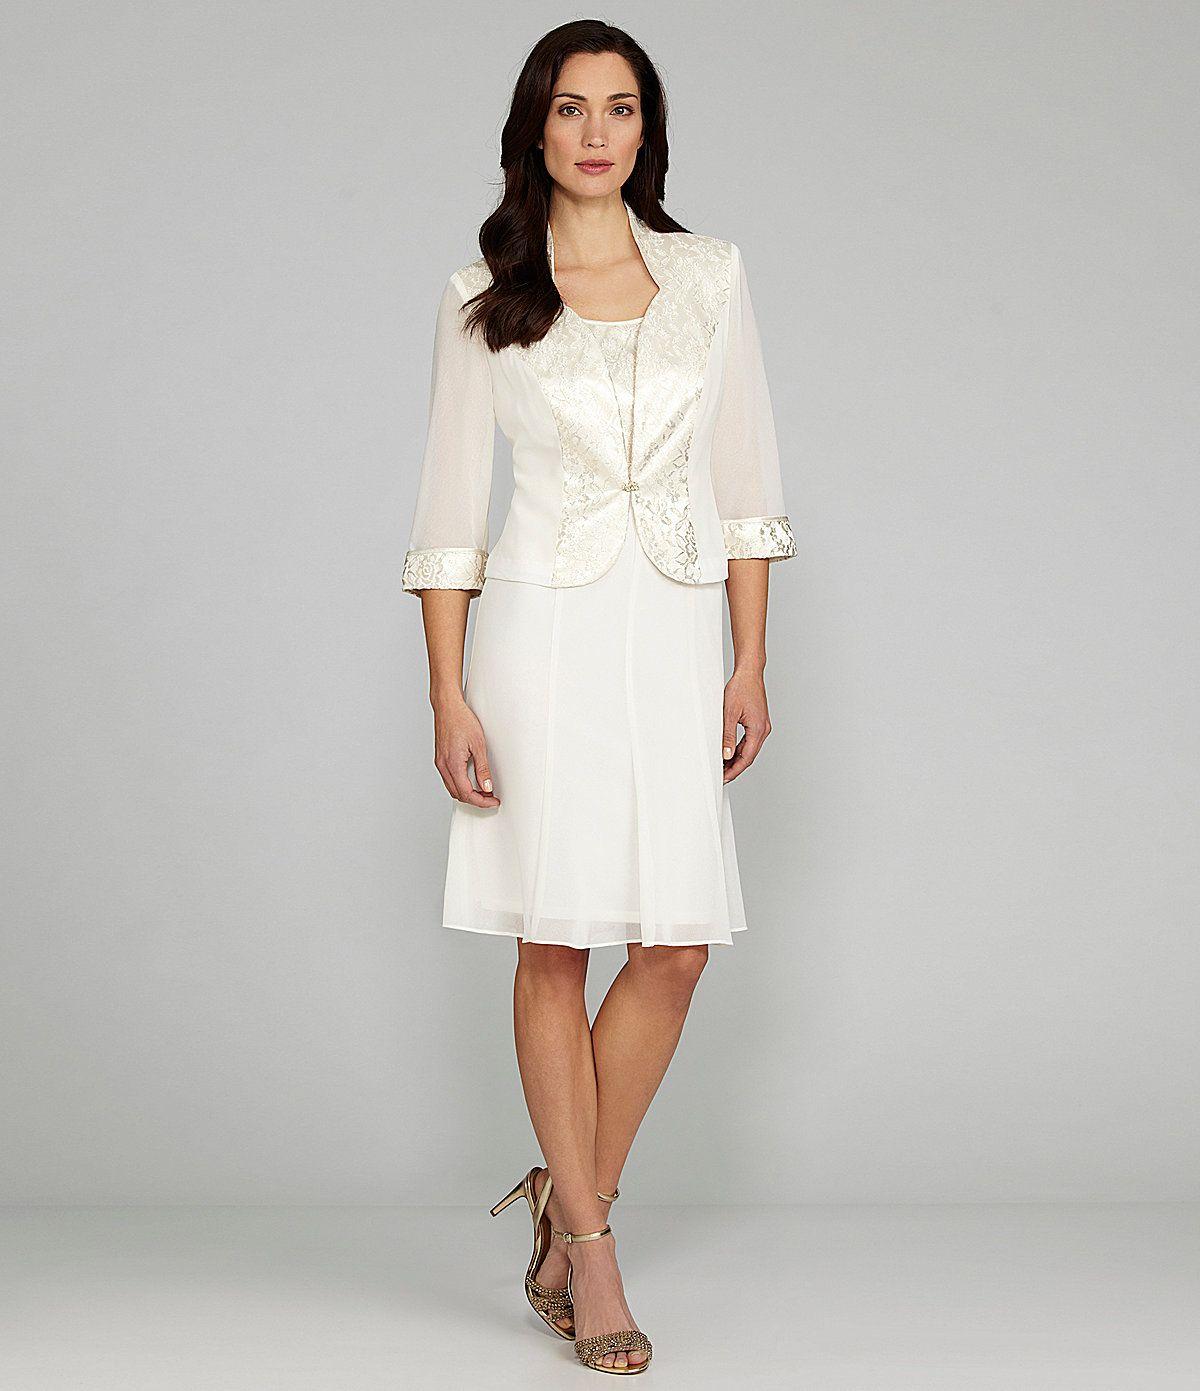 Wedding dresses dillards  Le Bos Woman Piece Jacket Dress  Dillards I think we found a